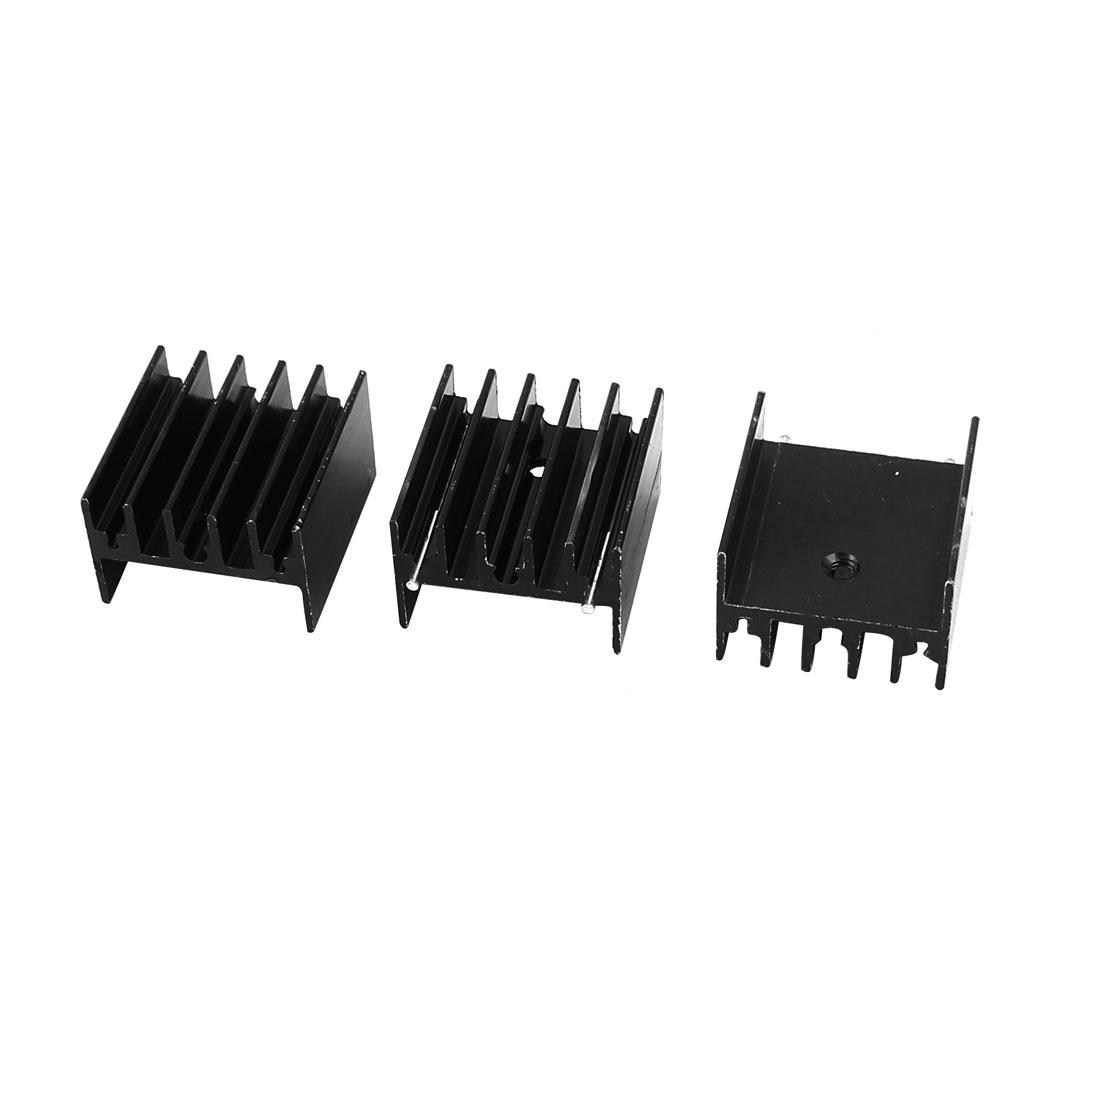 3 Pcs Black Aluminum Heat Sink 25x23x16mm for TO-220 Transistors